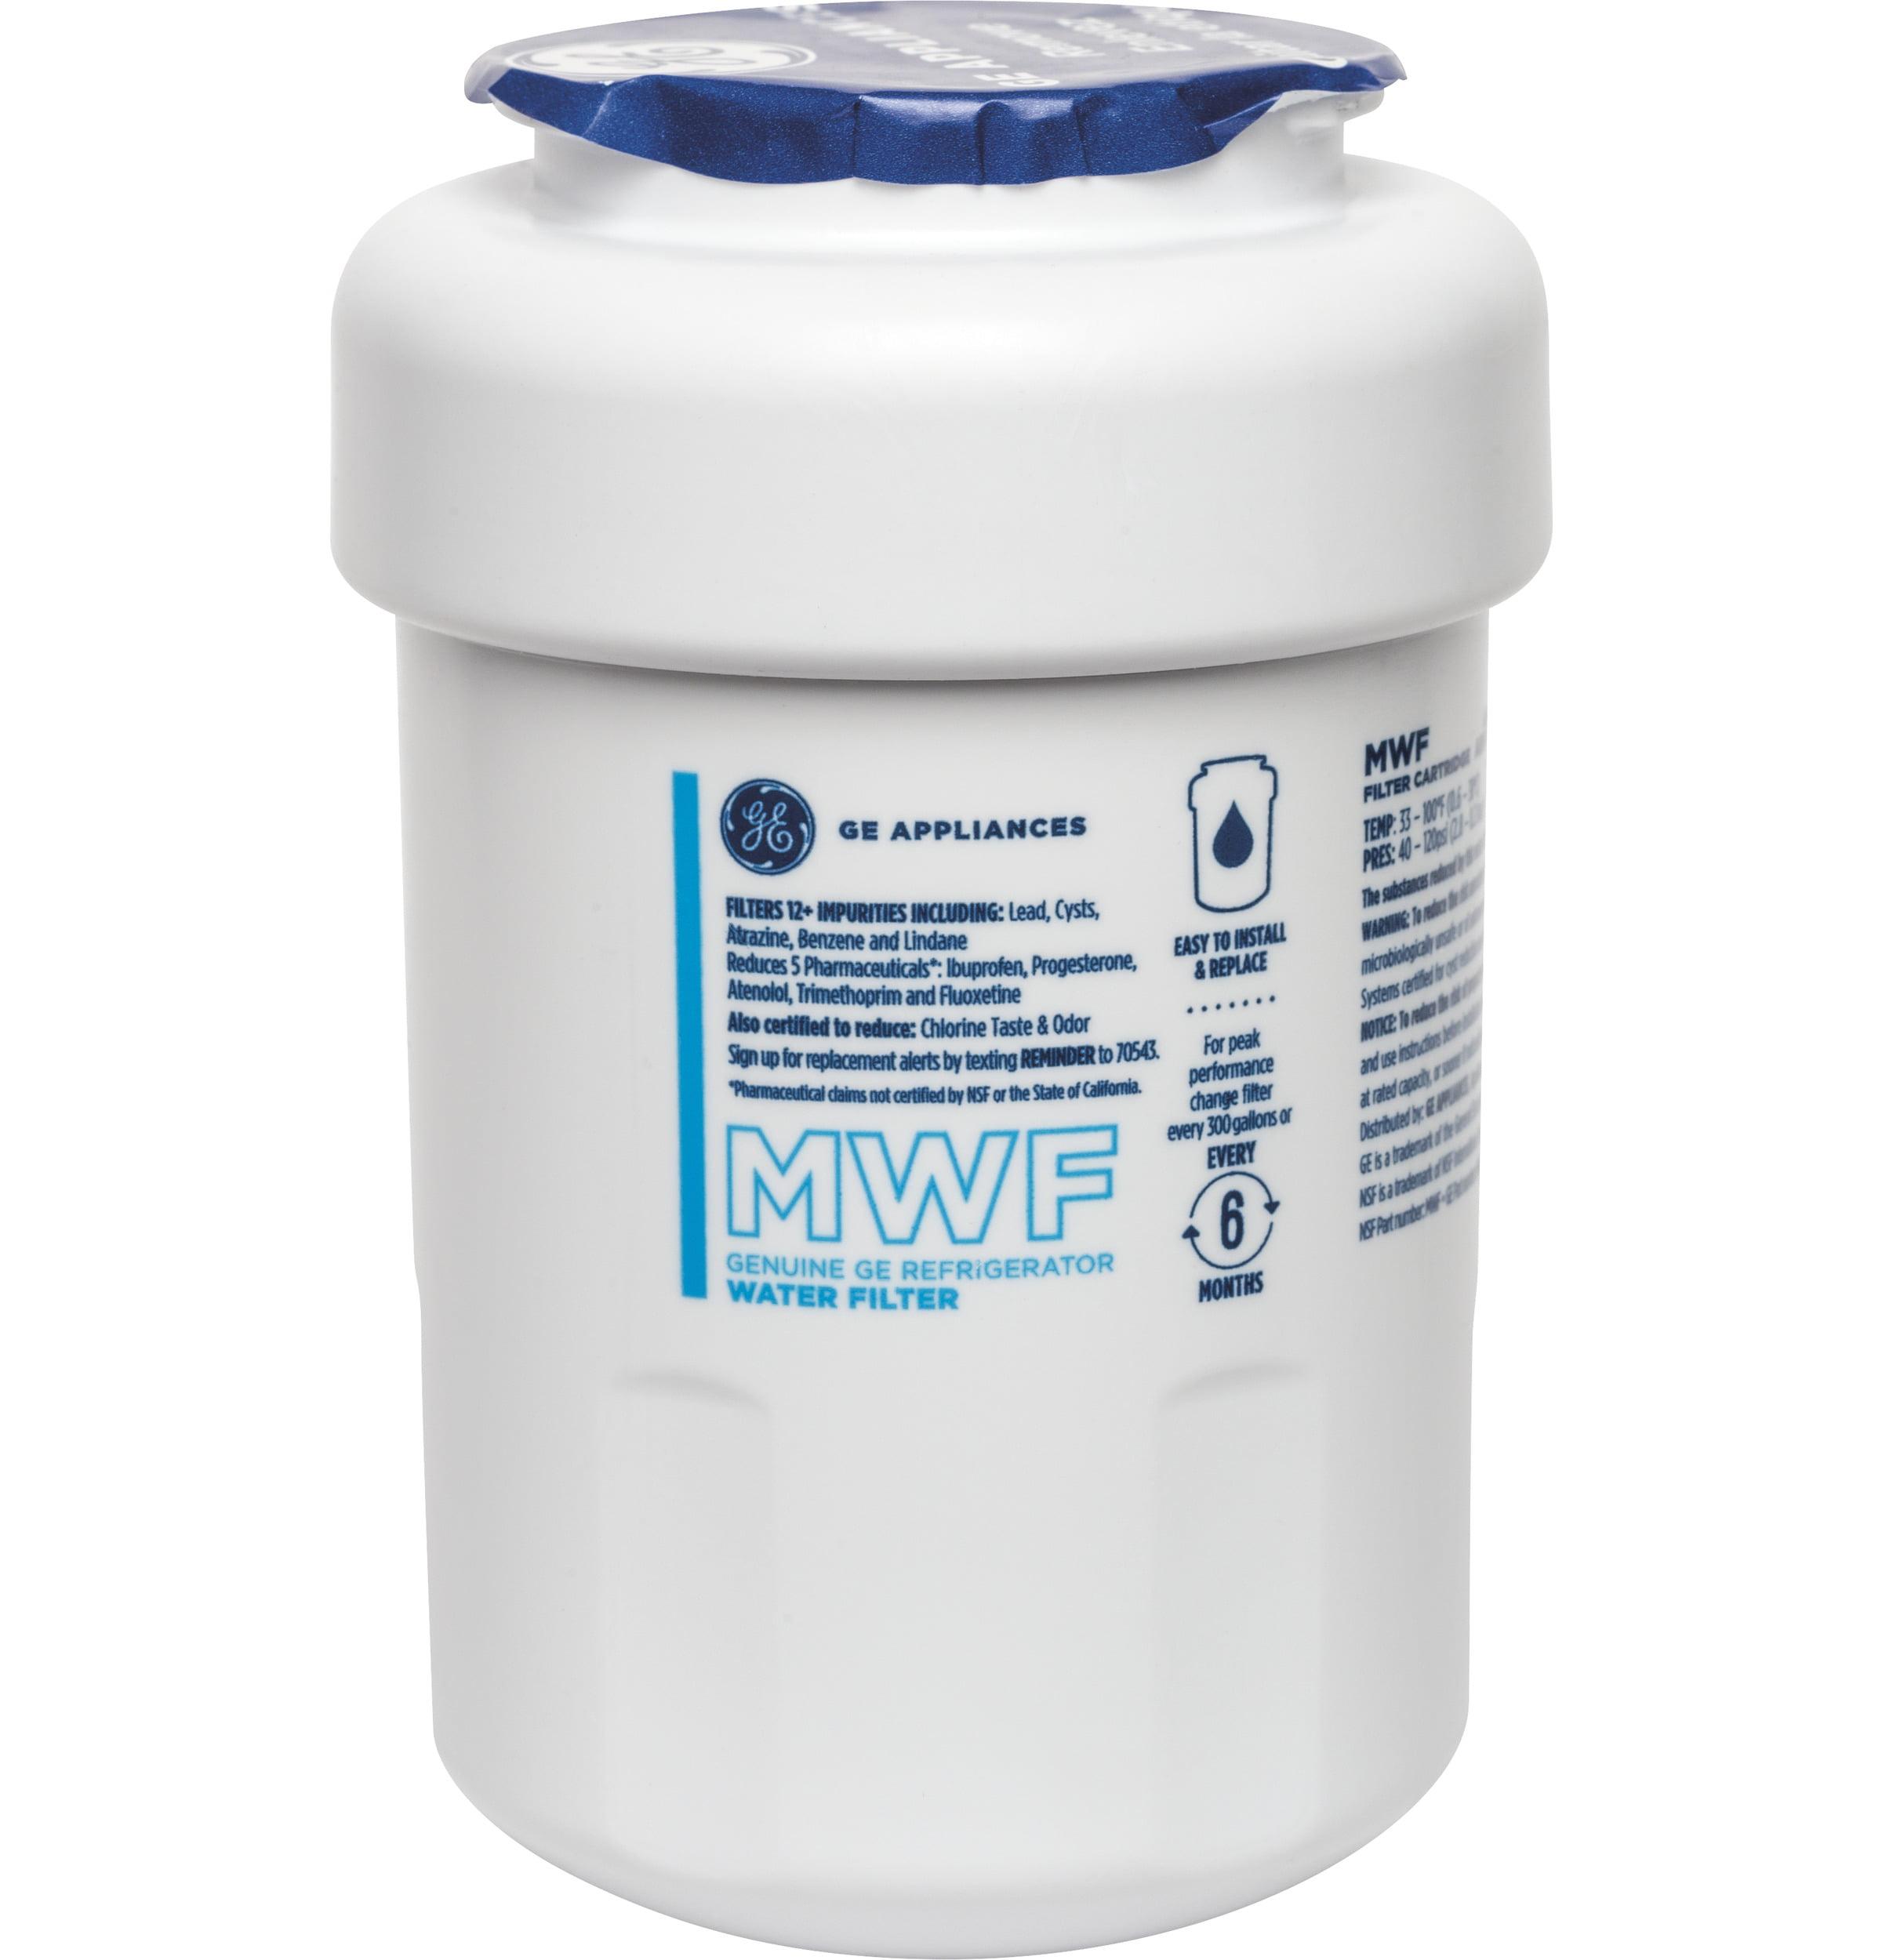 GE MWF Replacement Refrigerator Water Filter Cartridge #MWF